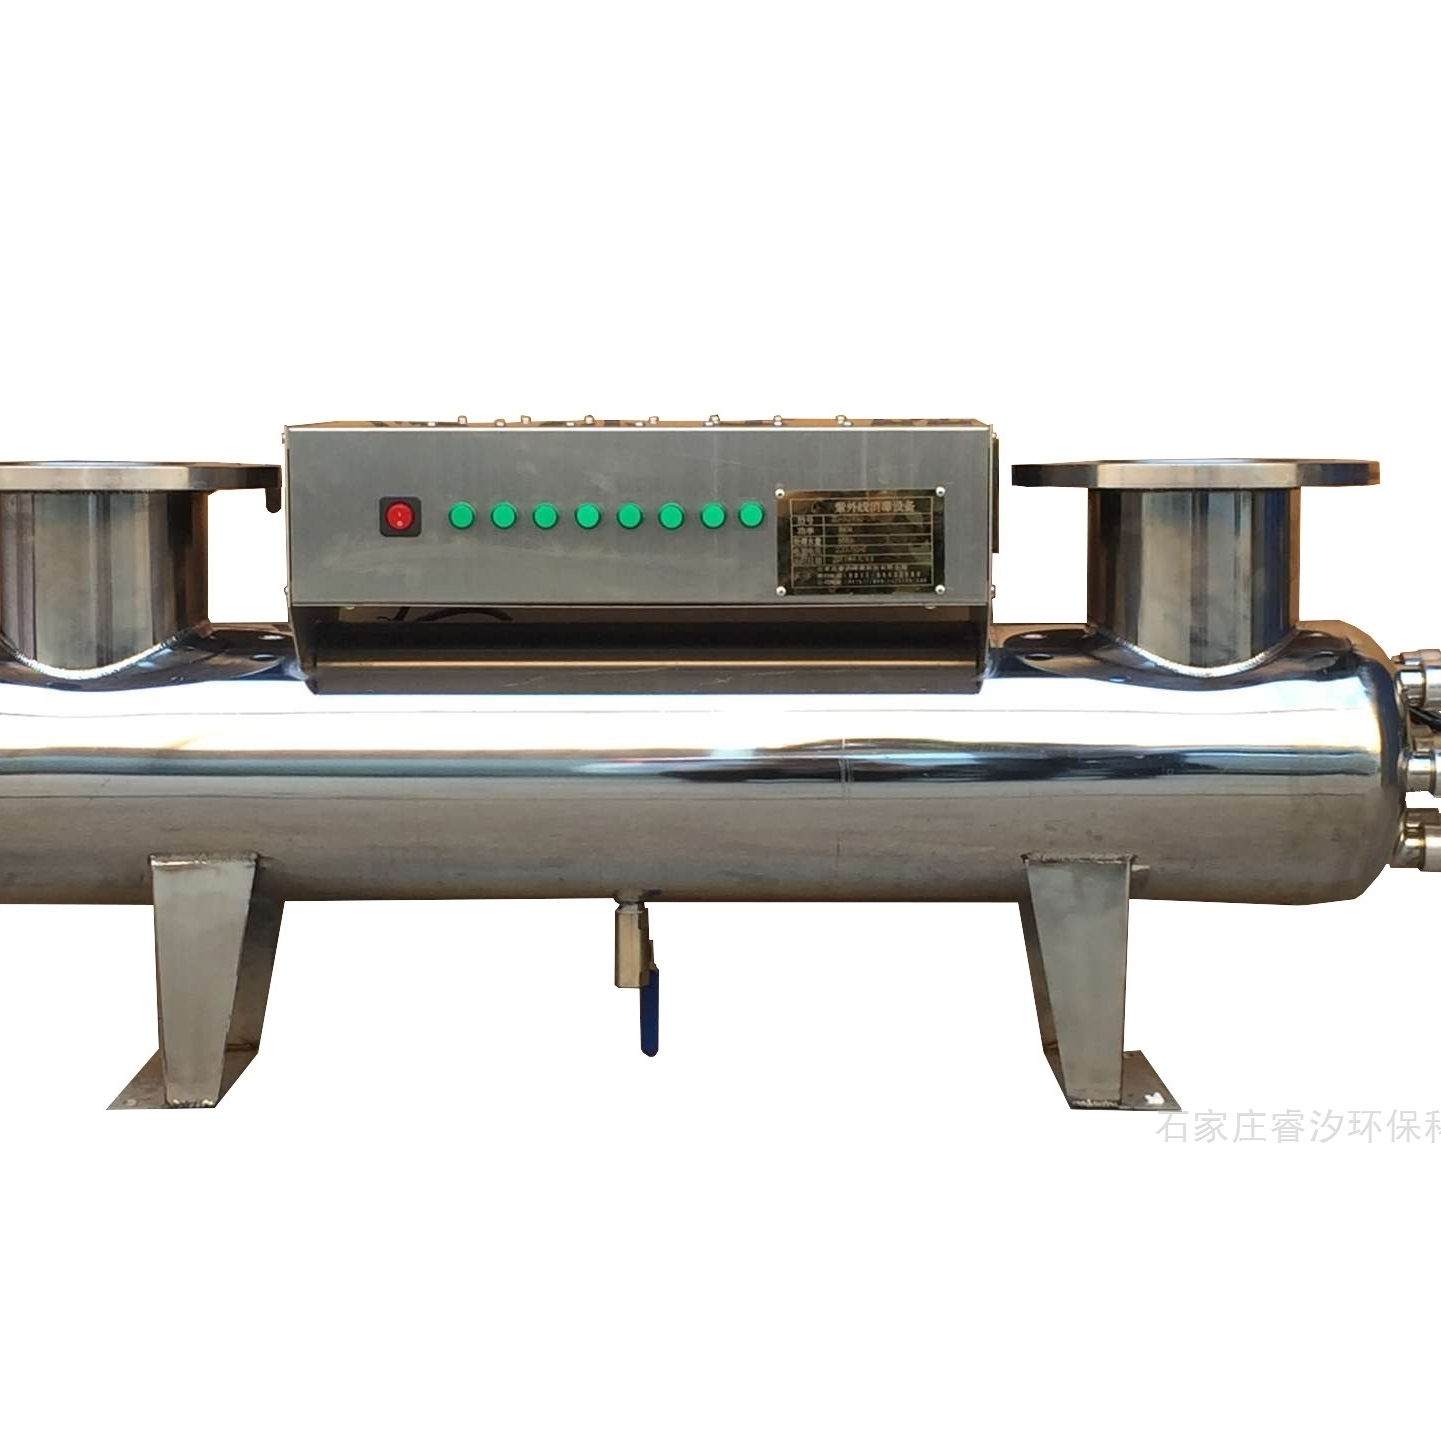 LCW-II-U(S)-60-0.6紫外线消毒器